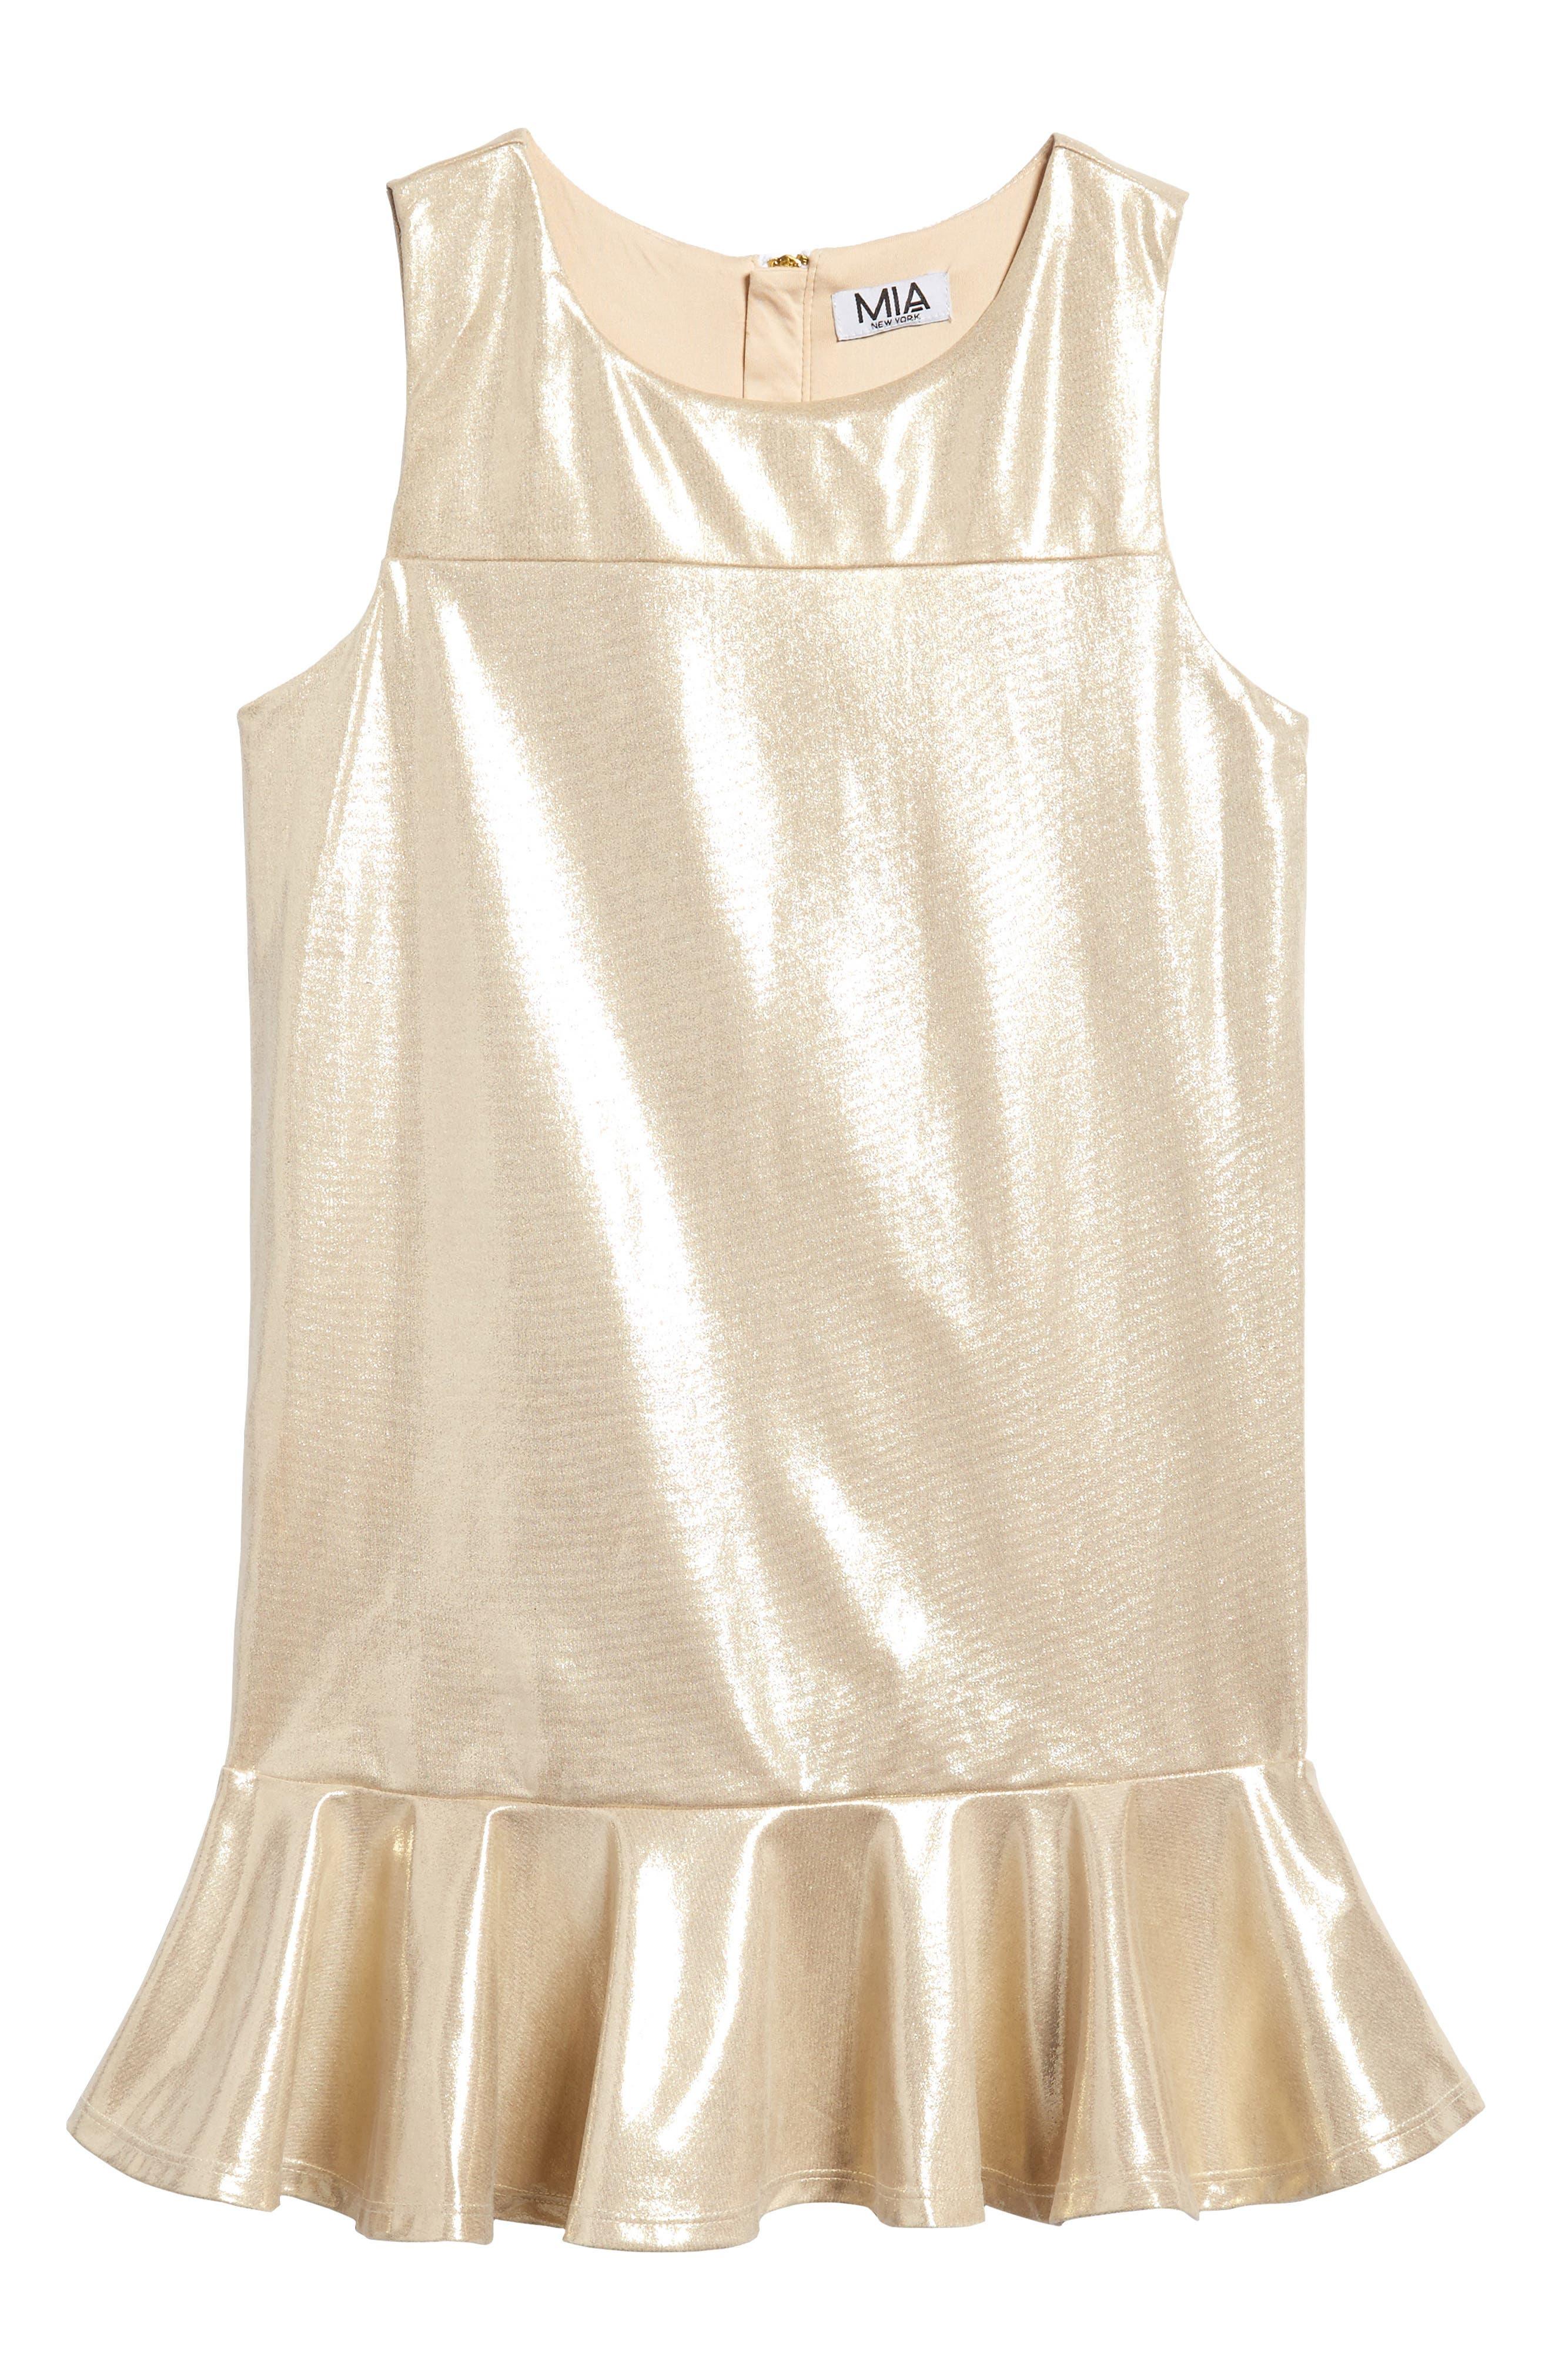 Main Image - Mia New York Liquid Shine Dress (Big Girls)